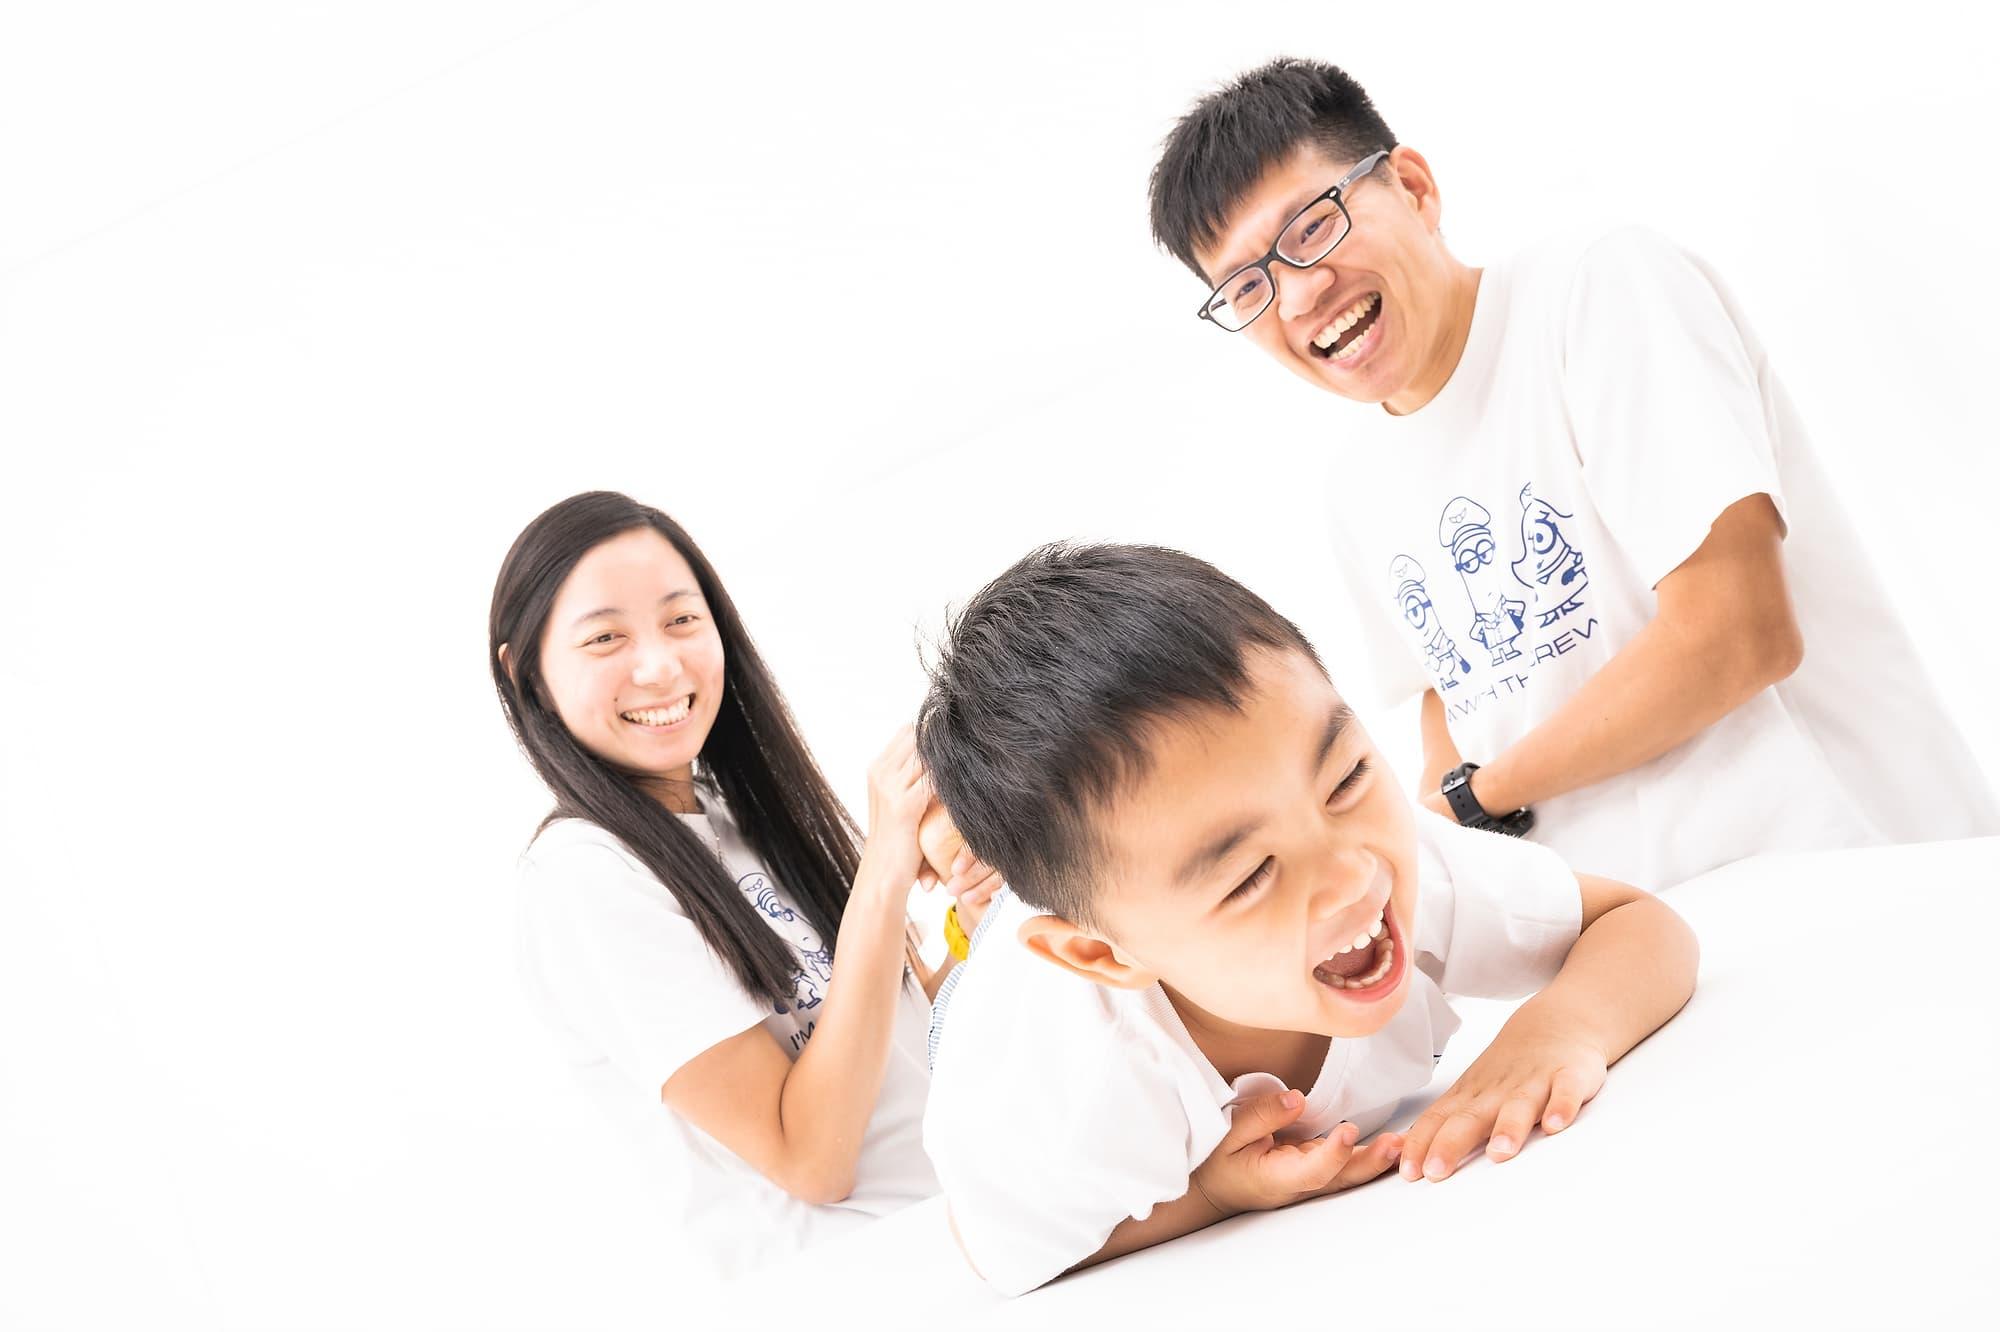 DAWN FAMILY PORTRAIT – by Daniel's Team